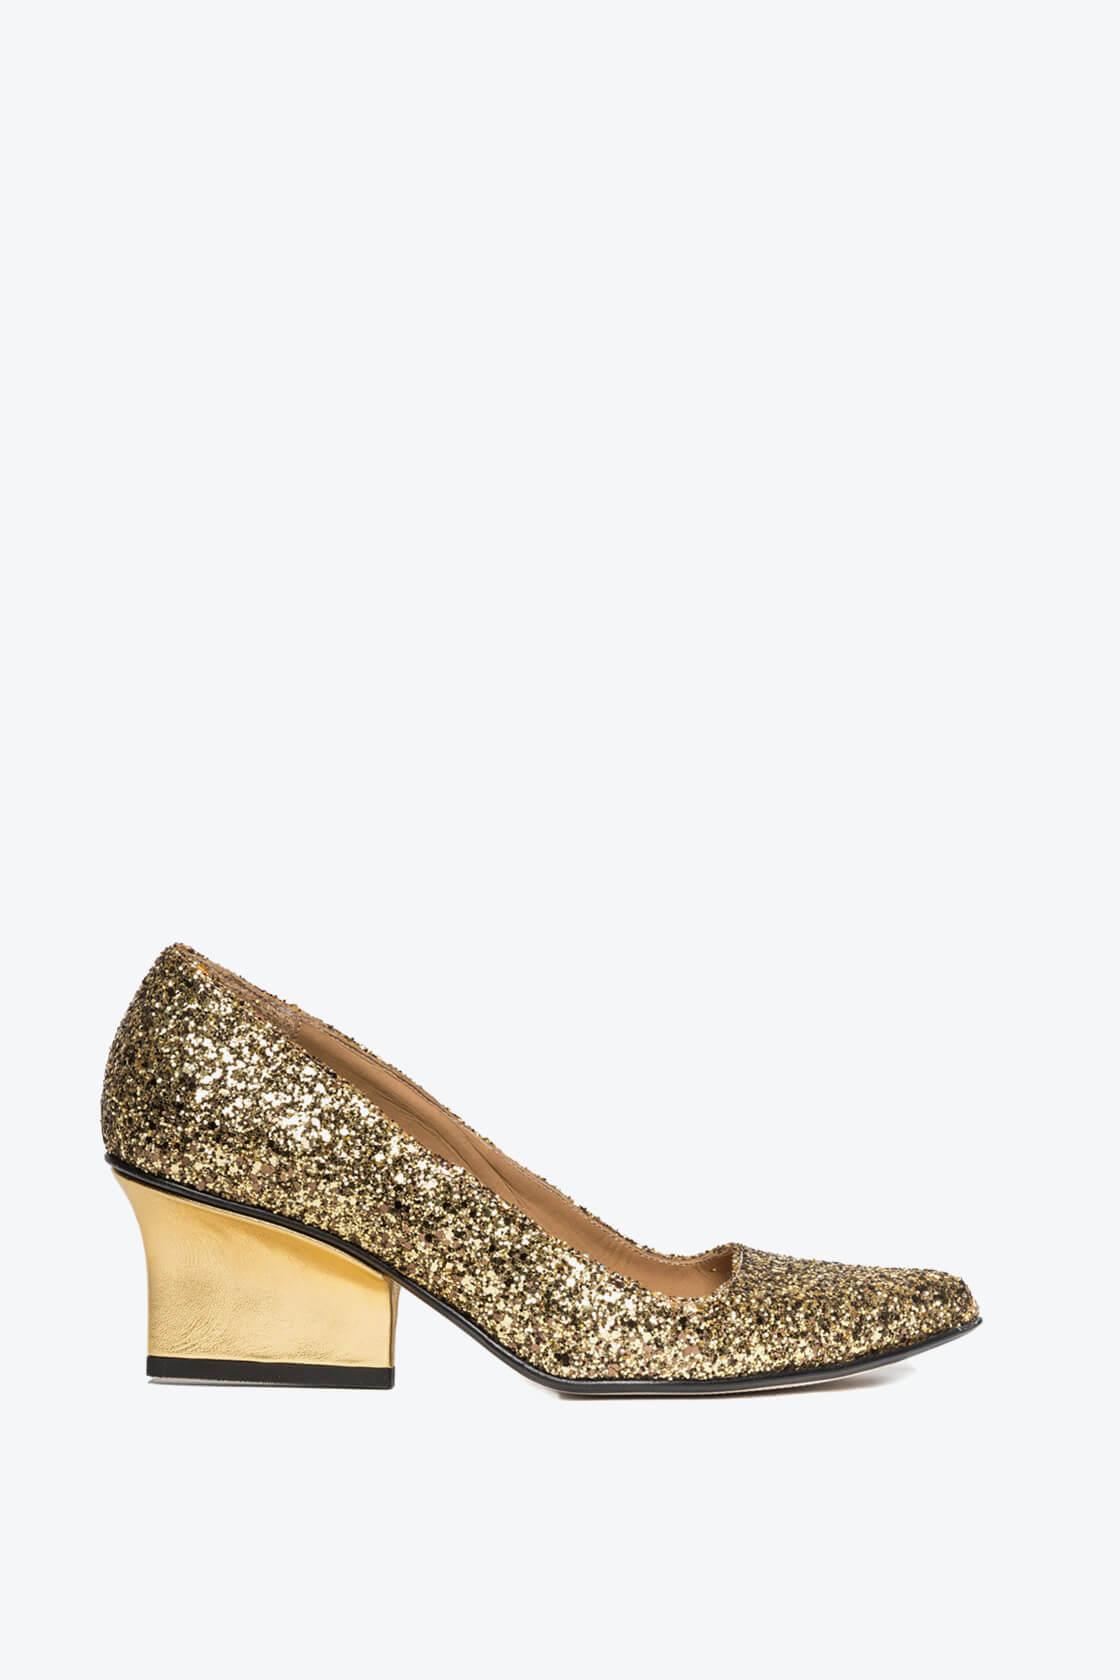 EJK0000076 Jo pumps gold glitter 1